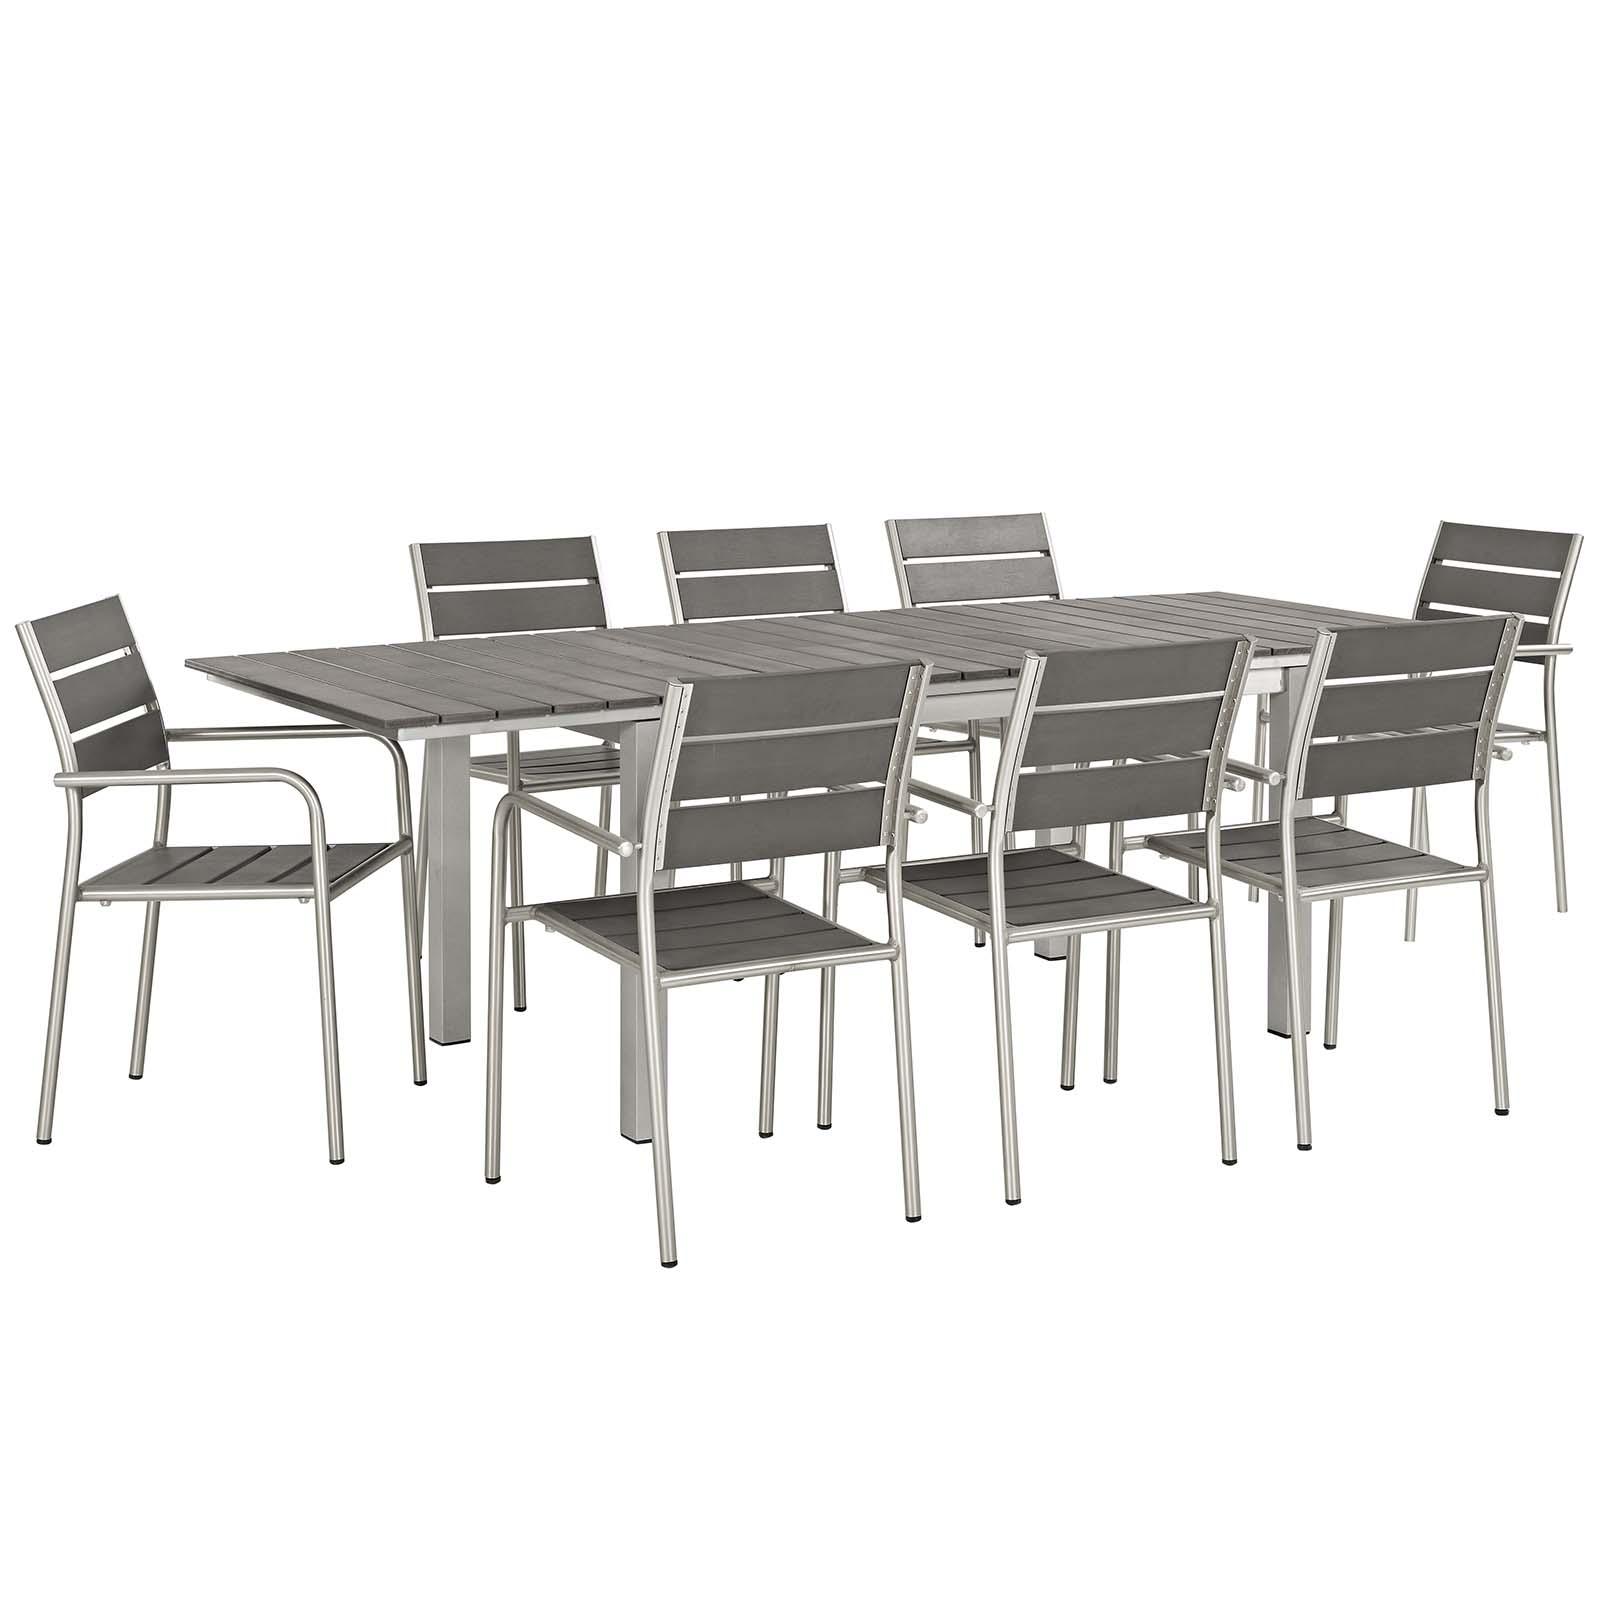 Shore 9 Piece Outdoor Patio Aluminum Outdoor Dining Set in Silver Gray